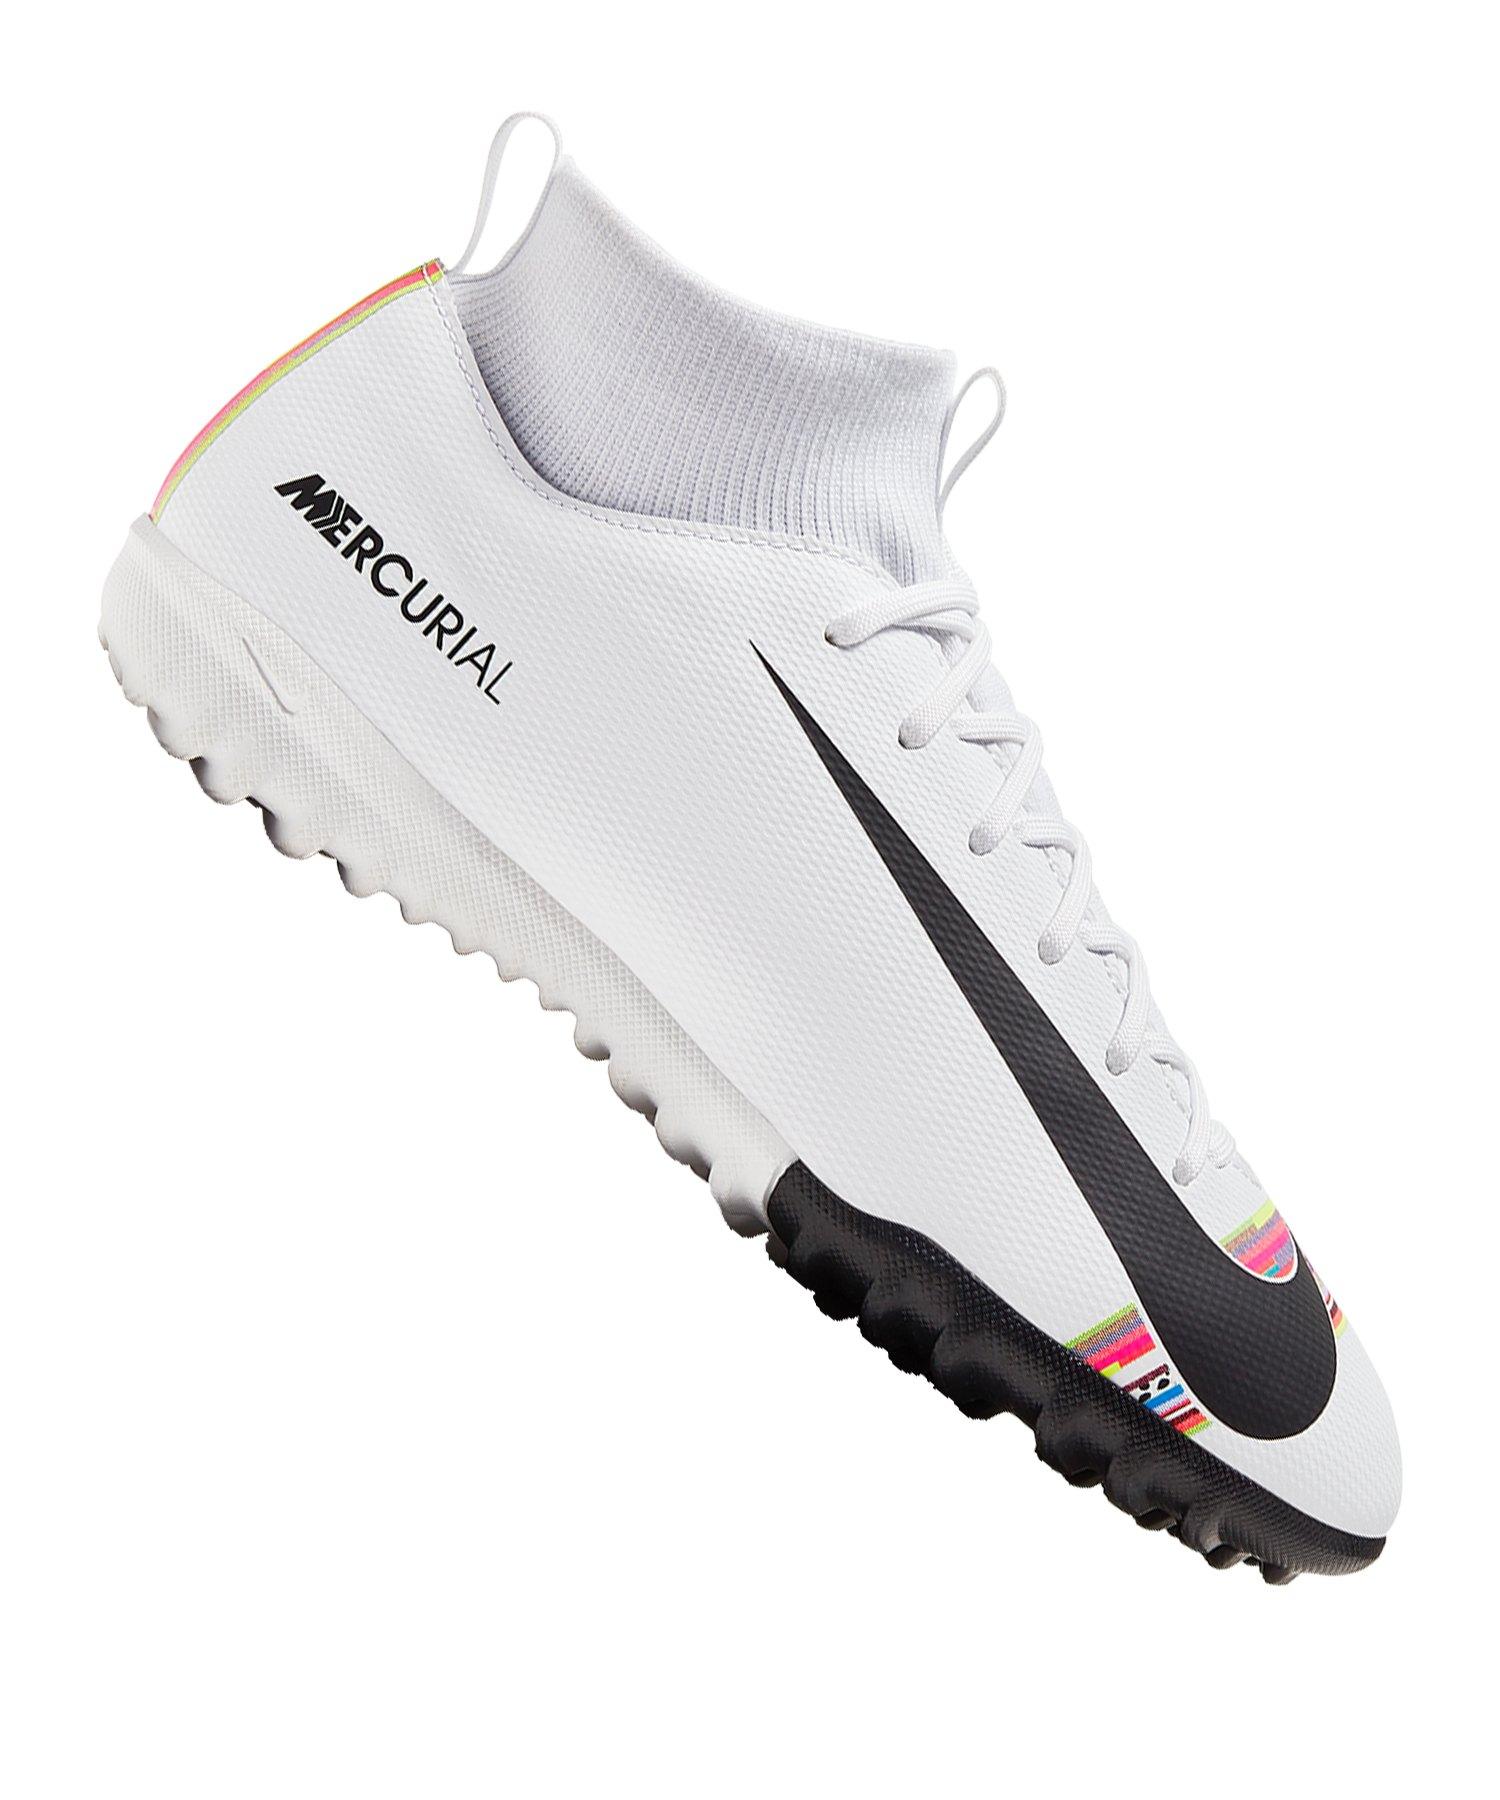 Nike Mercurial Superfly VI Academy TF GS Kids F109 - Weiss